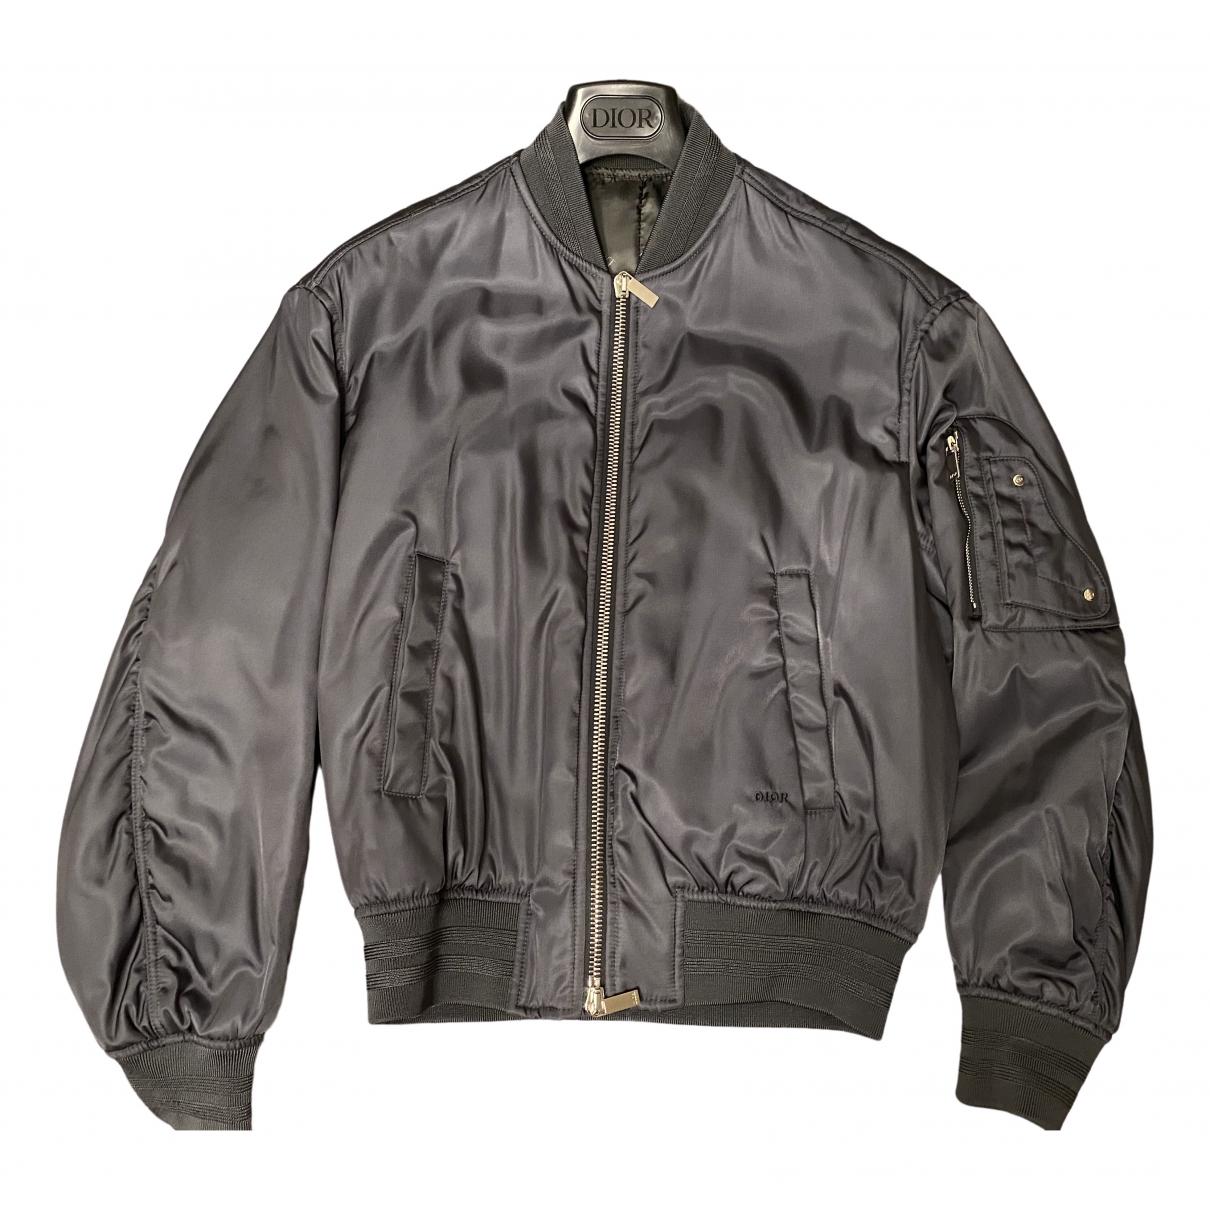 Dior Homme \N Jacke in  Grau Polyester